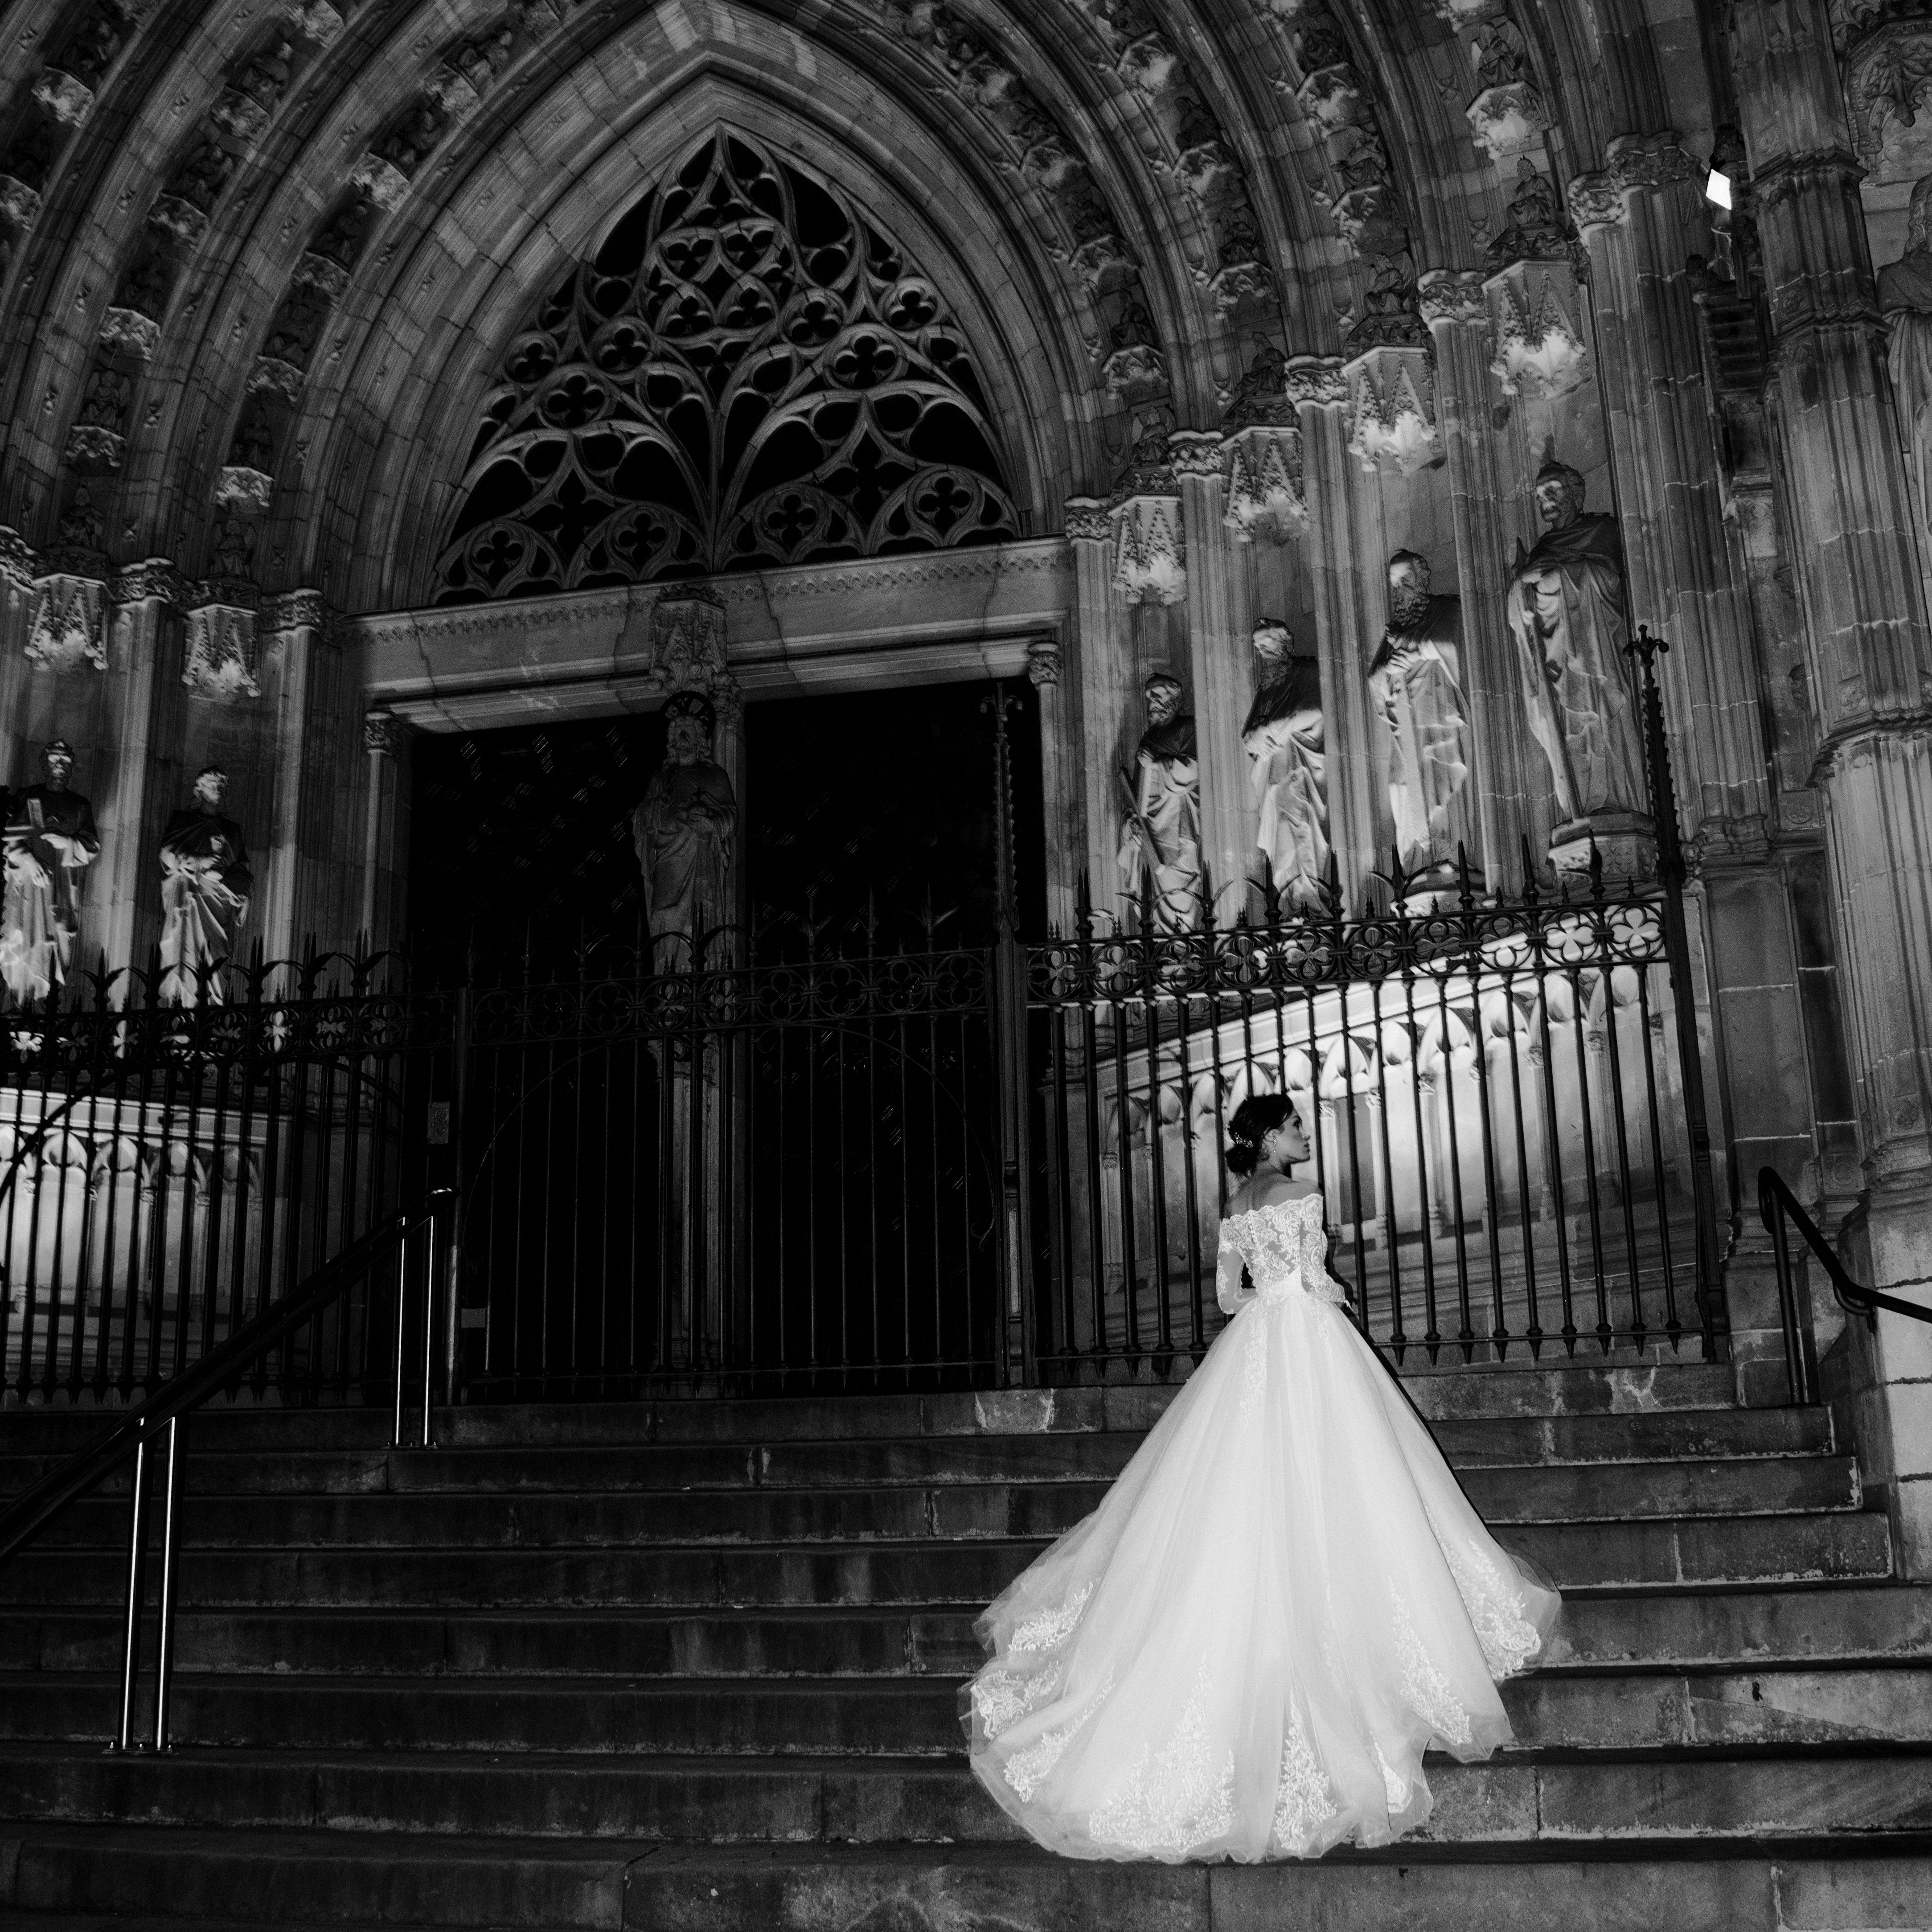 Suknia ślubna Norwood Dominiss - Dominiss